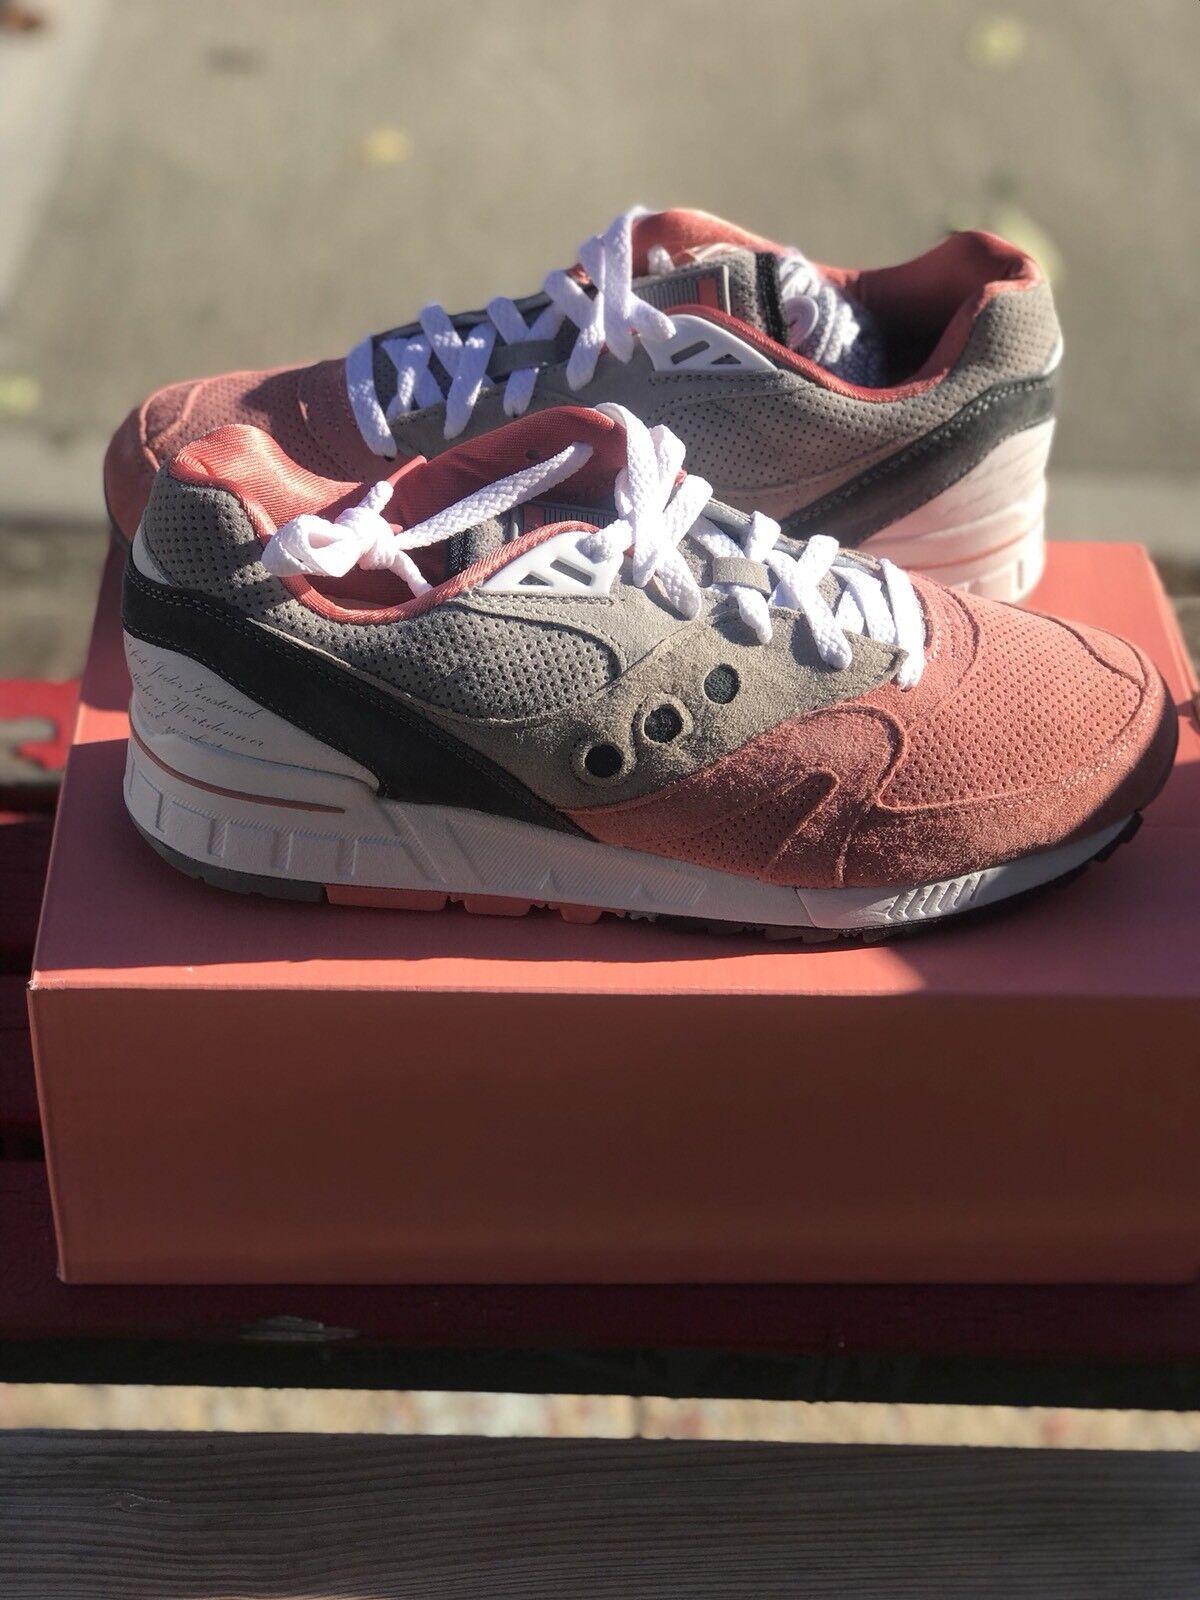 afew x SAUCONY Zapatos SHADOW Maestro 5000 GOETHE s70399-1 Hombre Zapatos SAUCONY Talla 10.5 1a164d